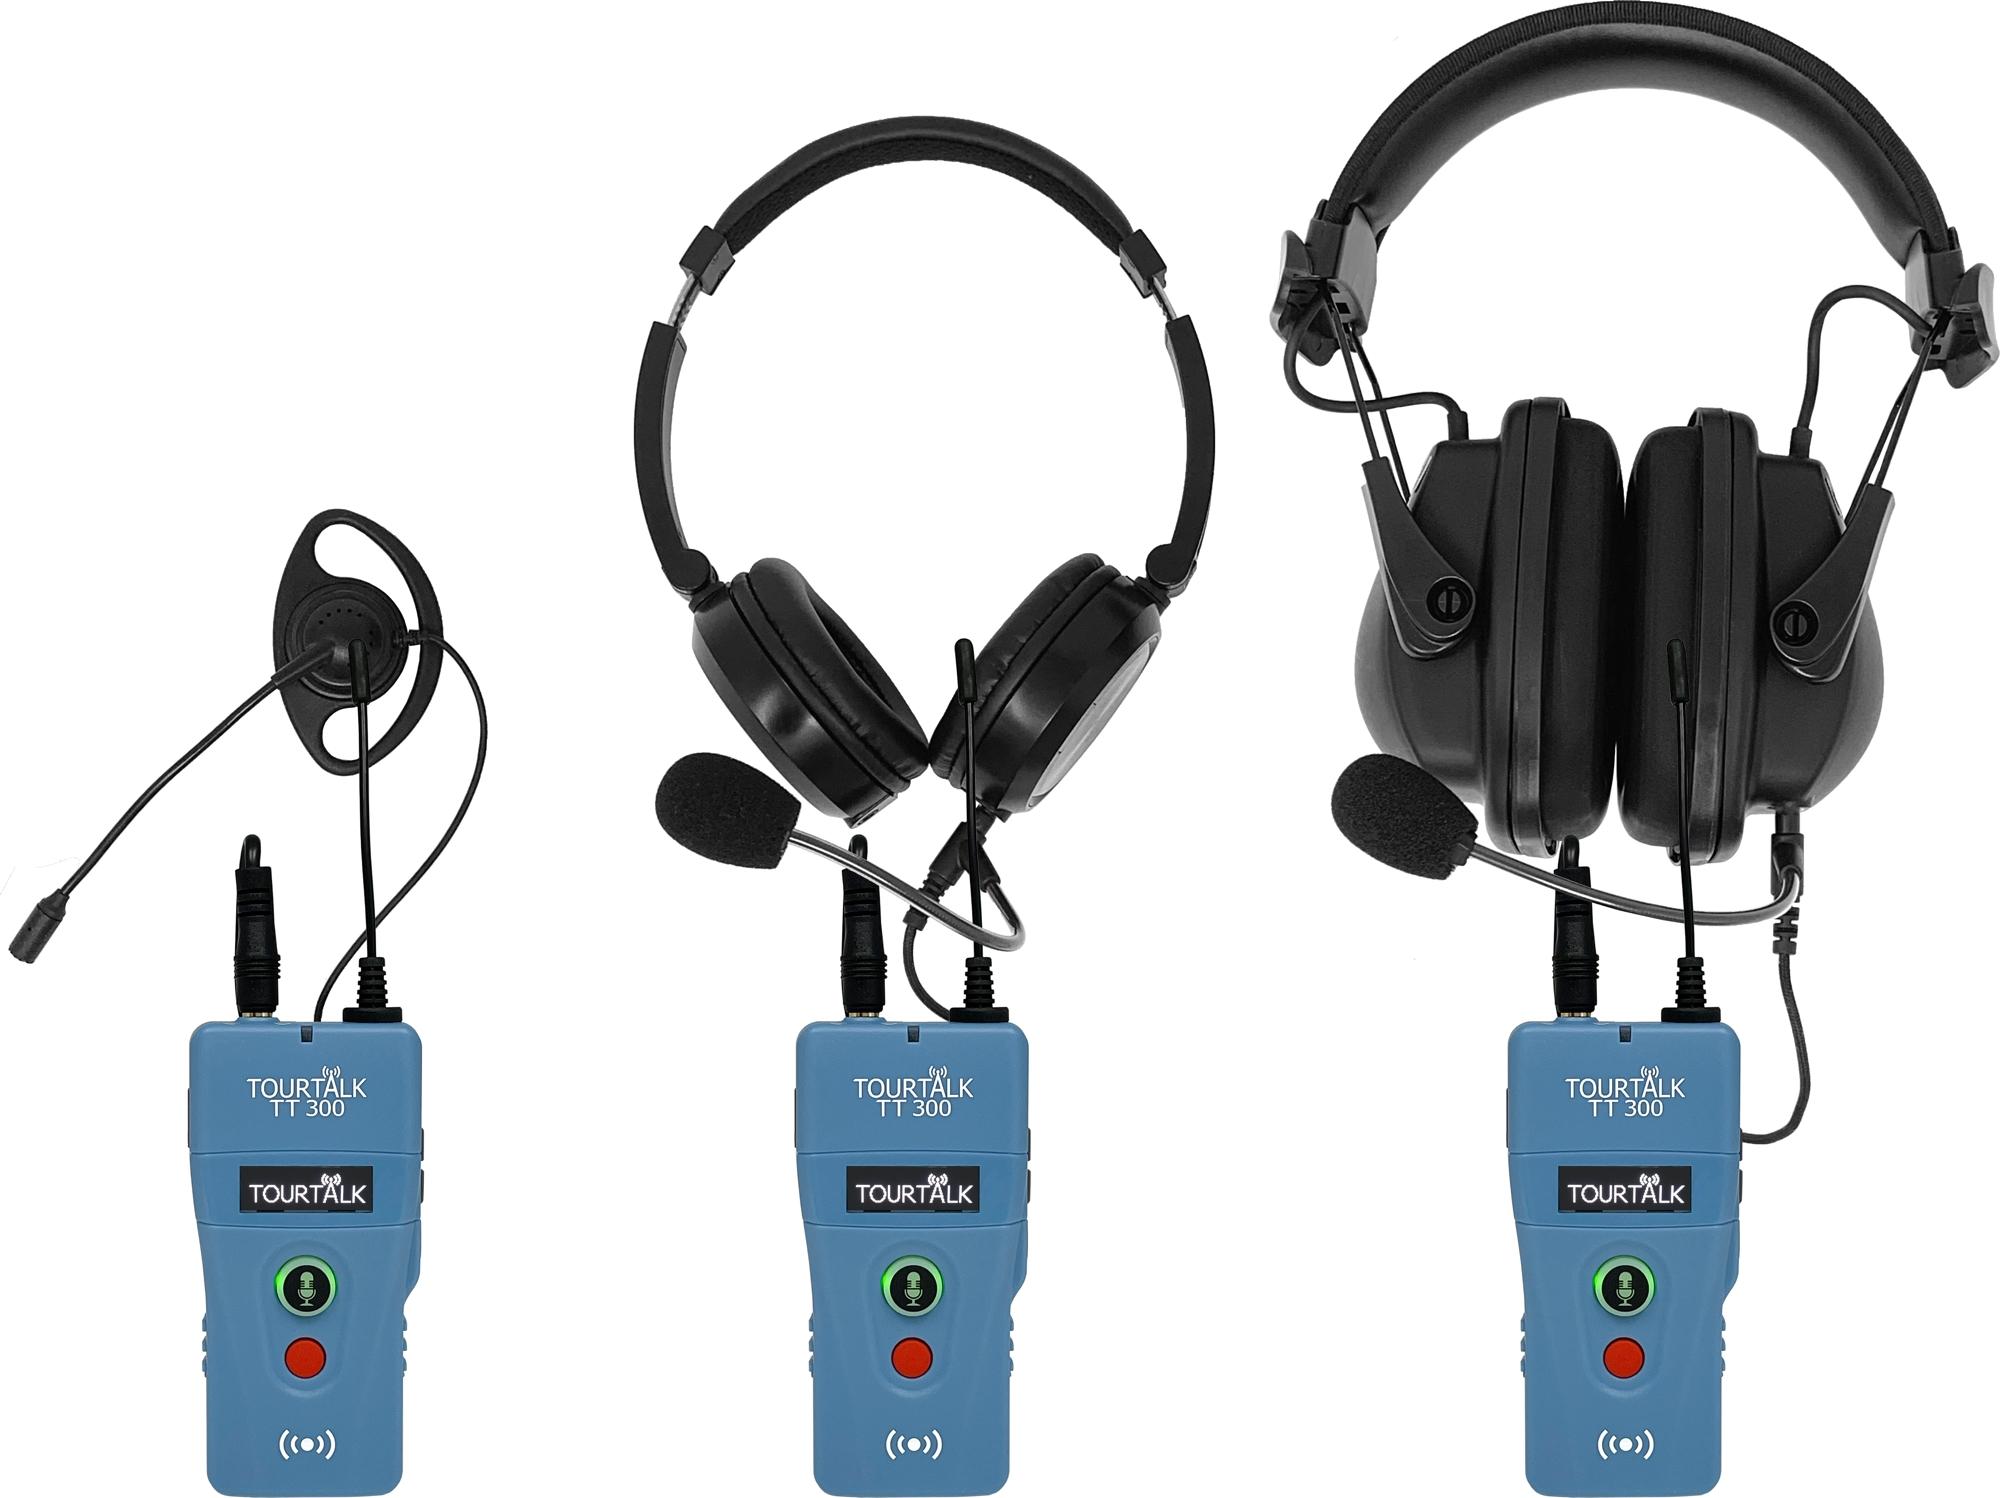 Wireless Tourtalk TT 300 full-duplex headsets